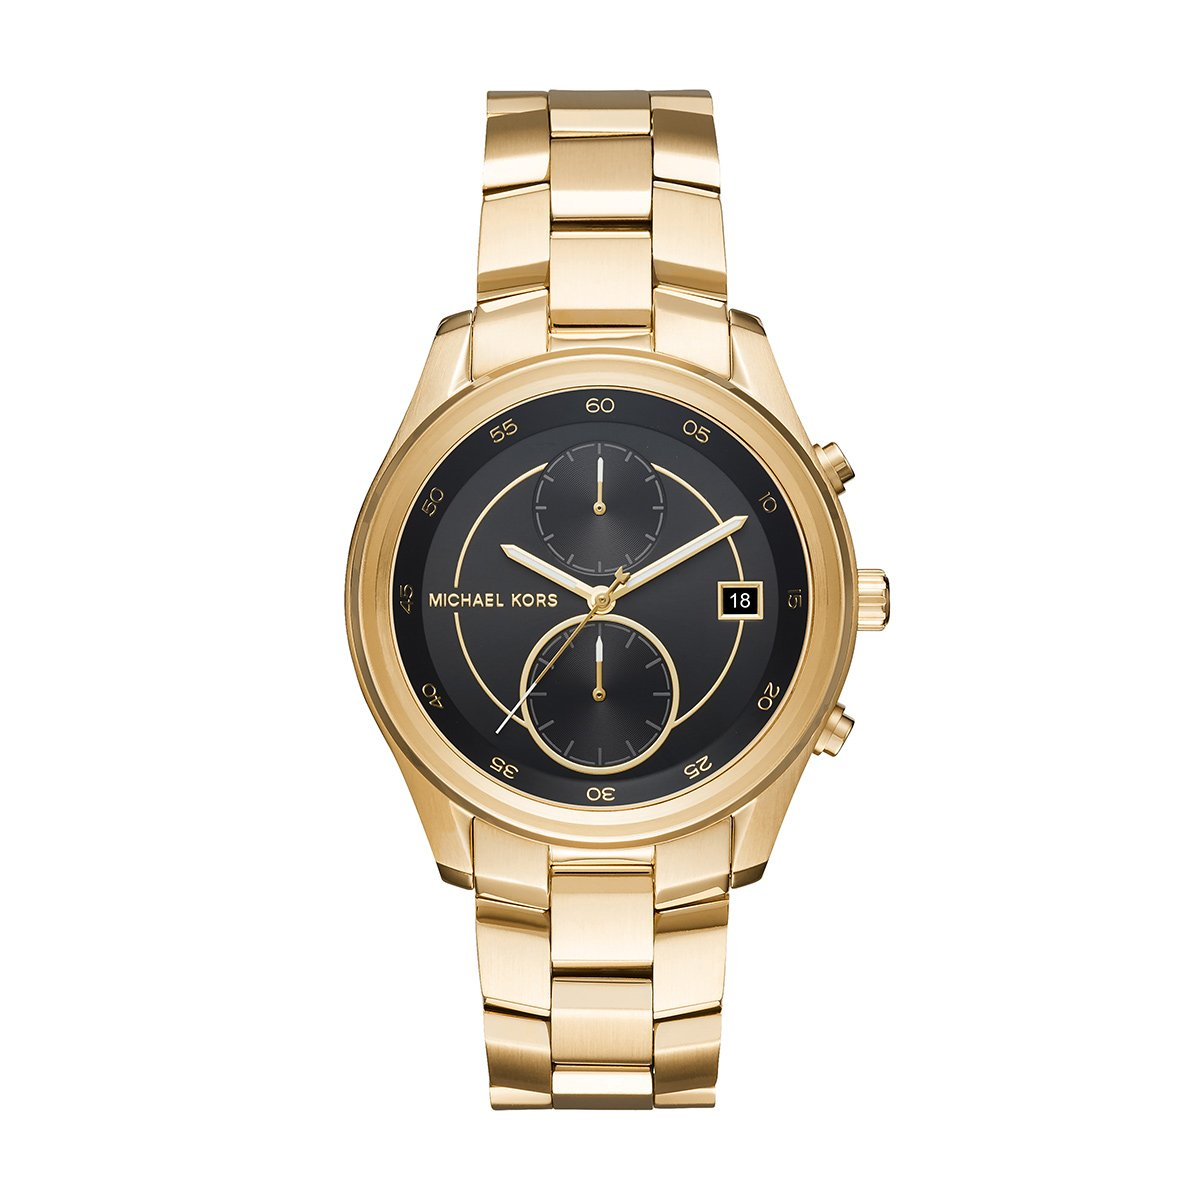 db8c2476dd5 Relógio Michael Kors Masculino Analógico MK6497 - Dourado - Compre Agora